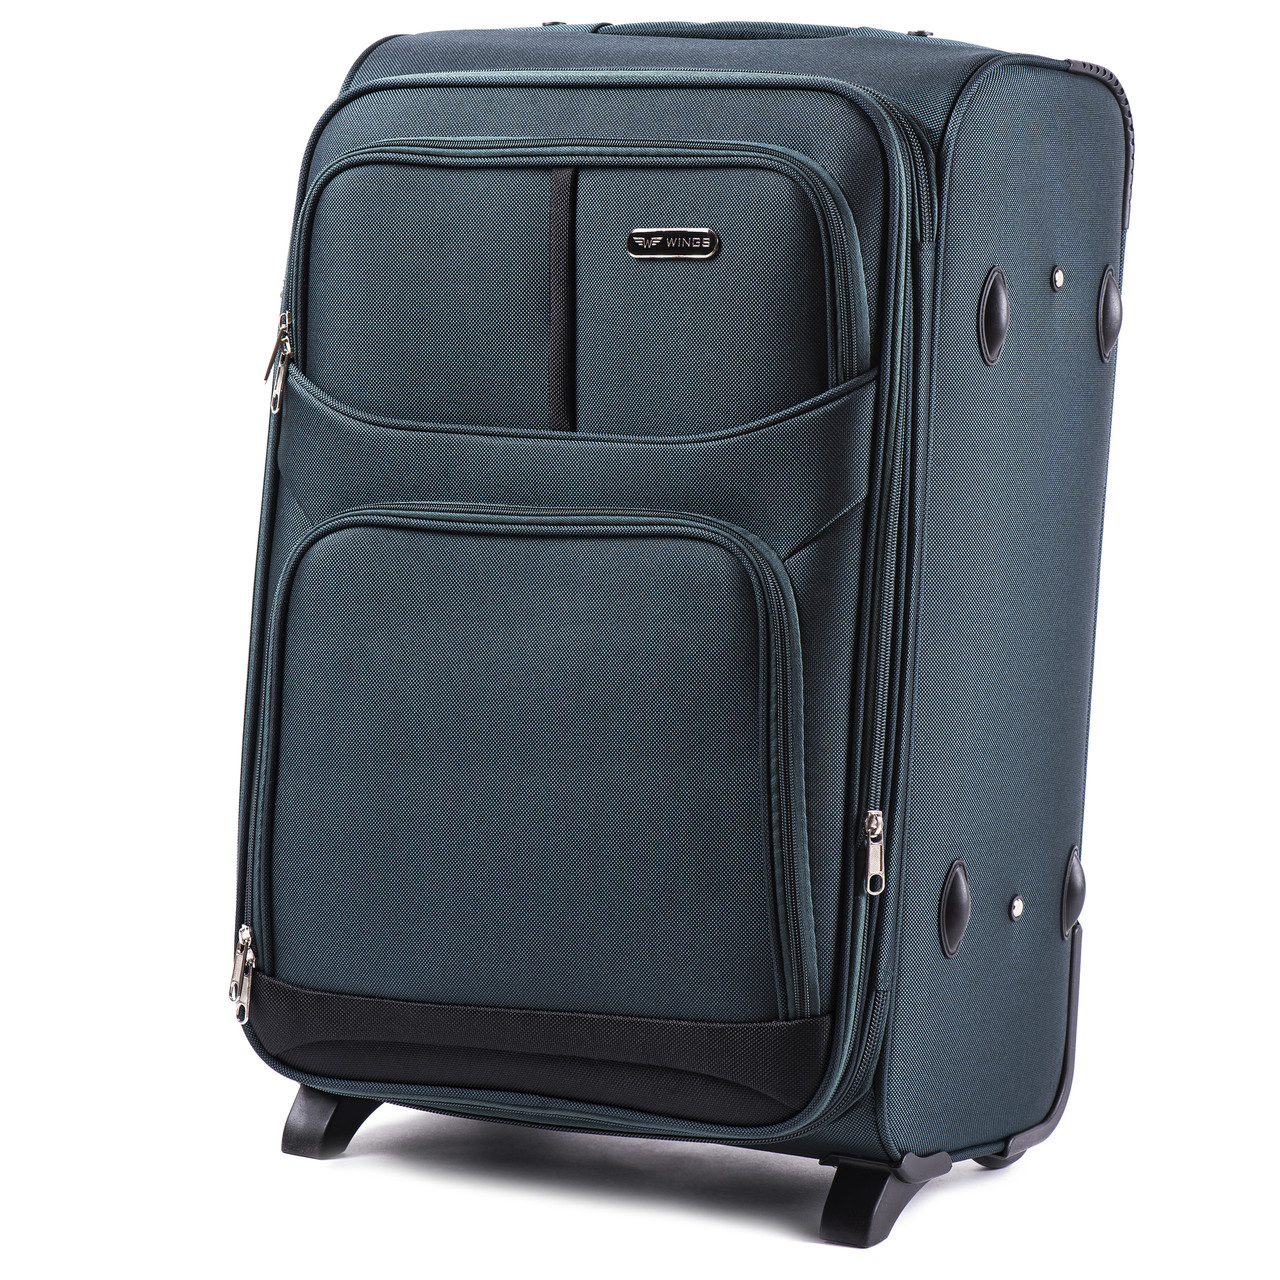 Средний тканевый чемодан Wings 206 на 2 колесах зеленый